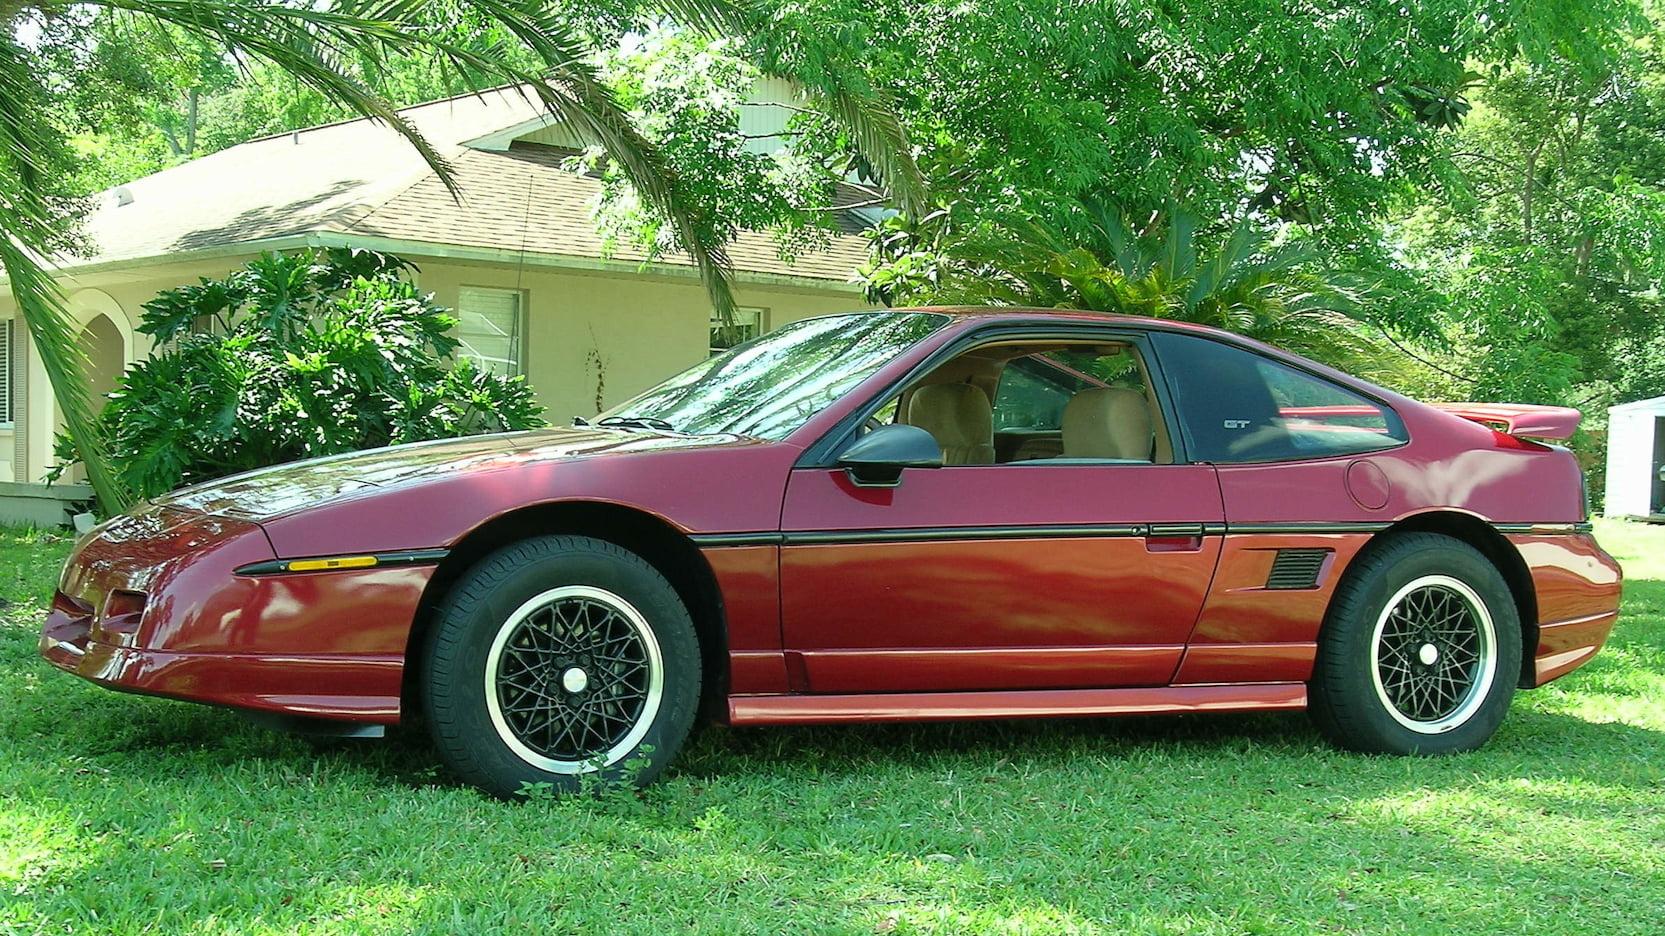 1988 Pontiac Fiero GT front 3/4